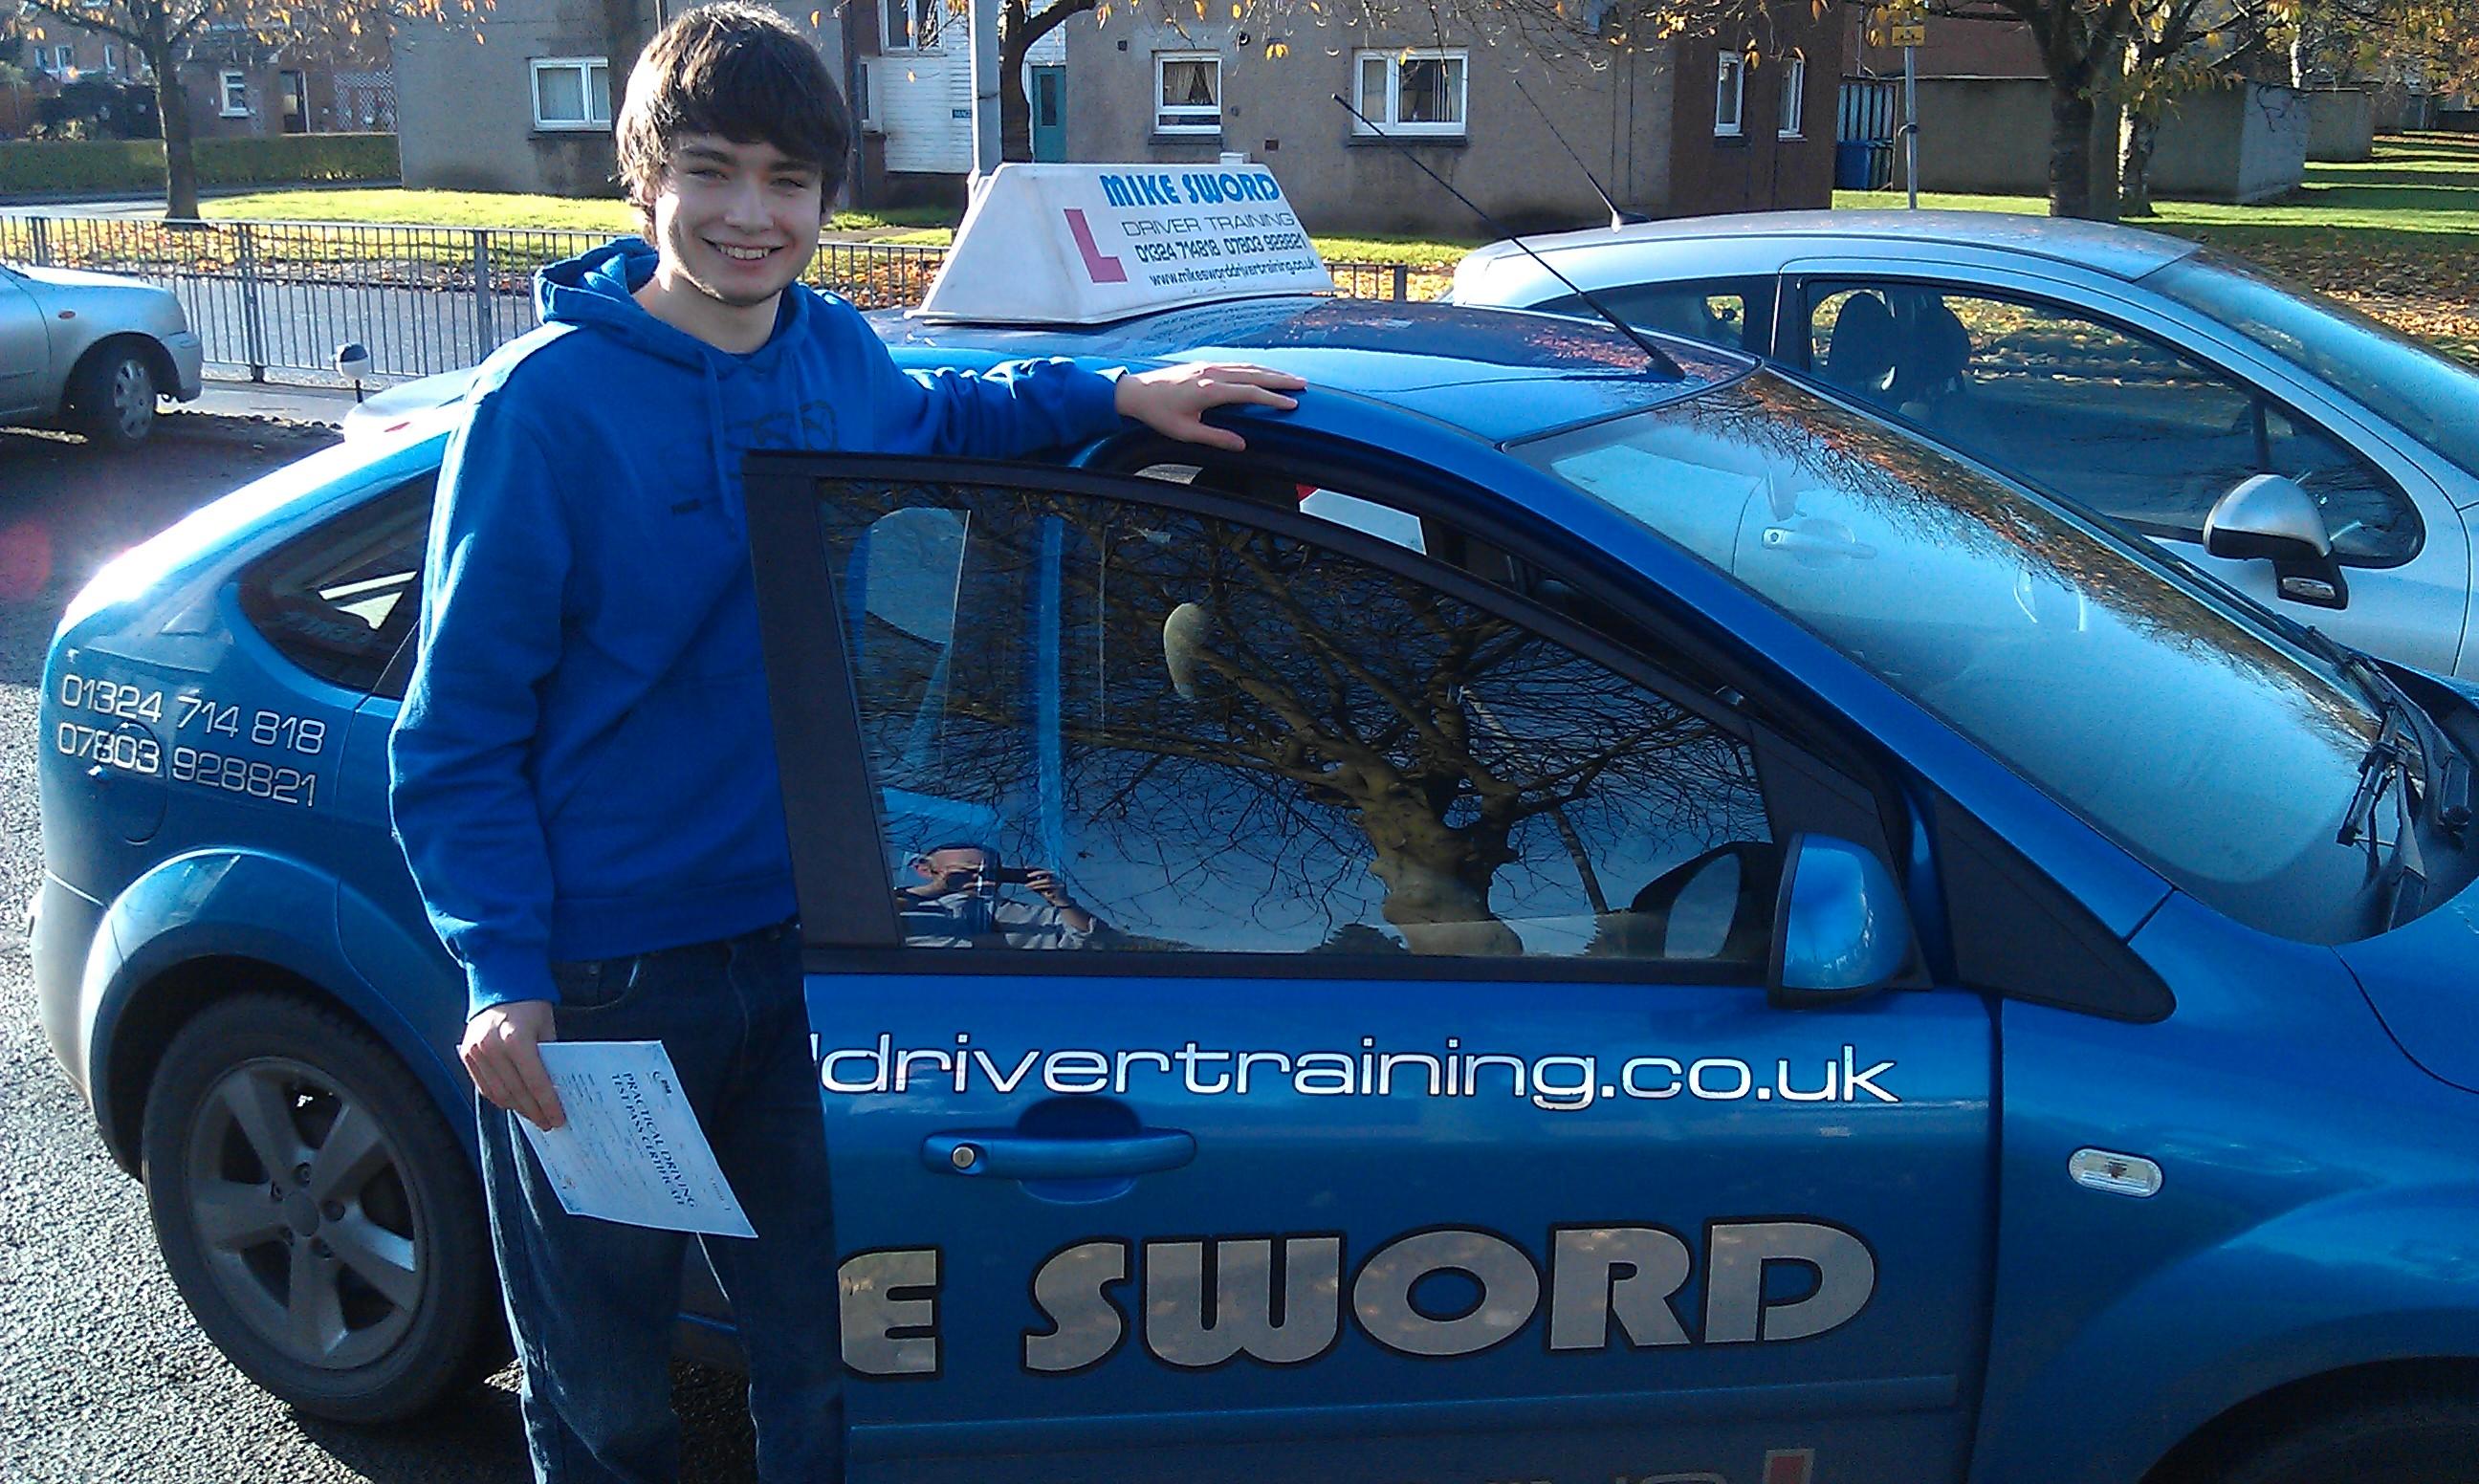 Christopher Lenathen Mike Sword Driver Training